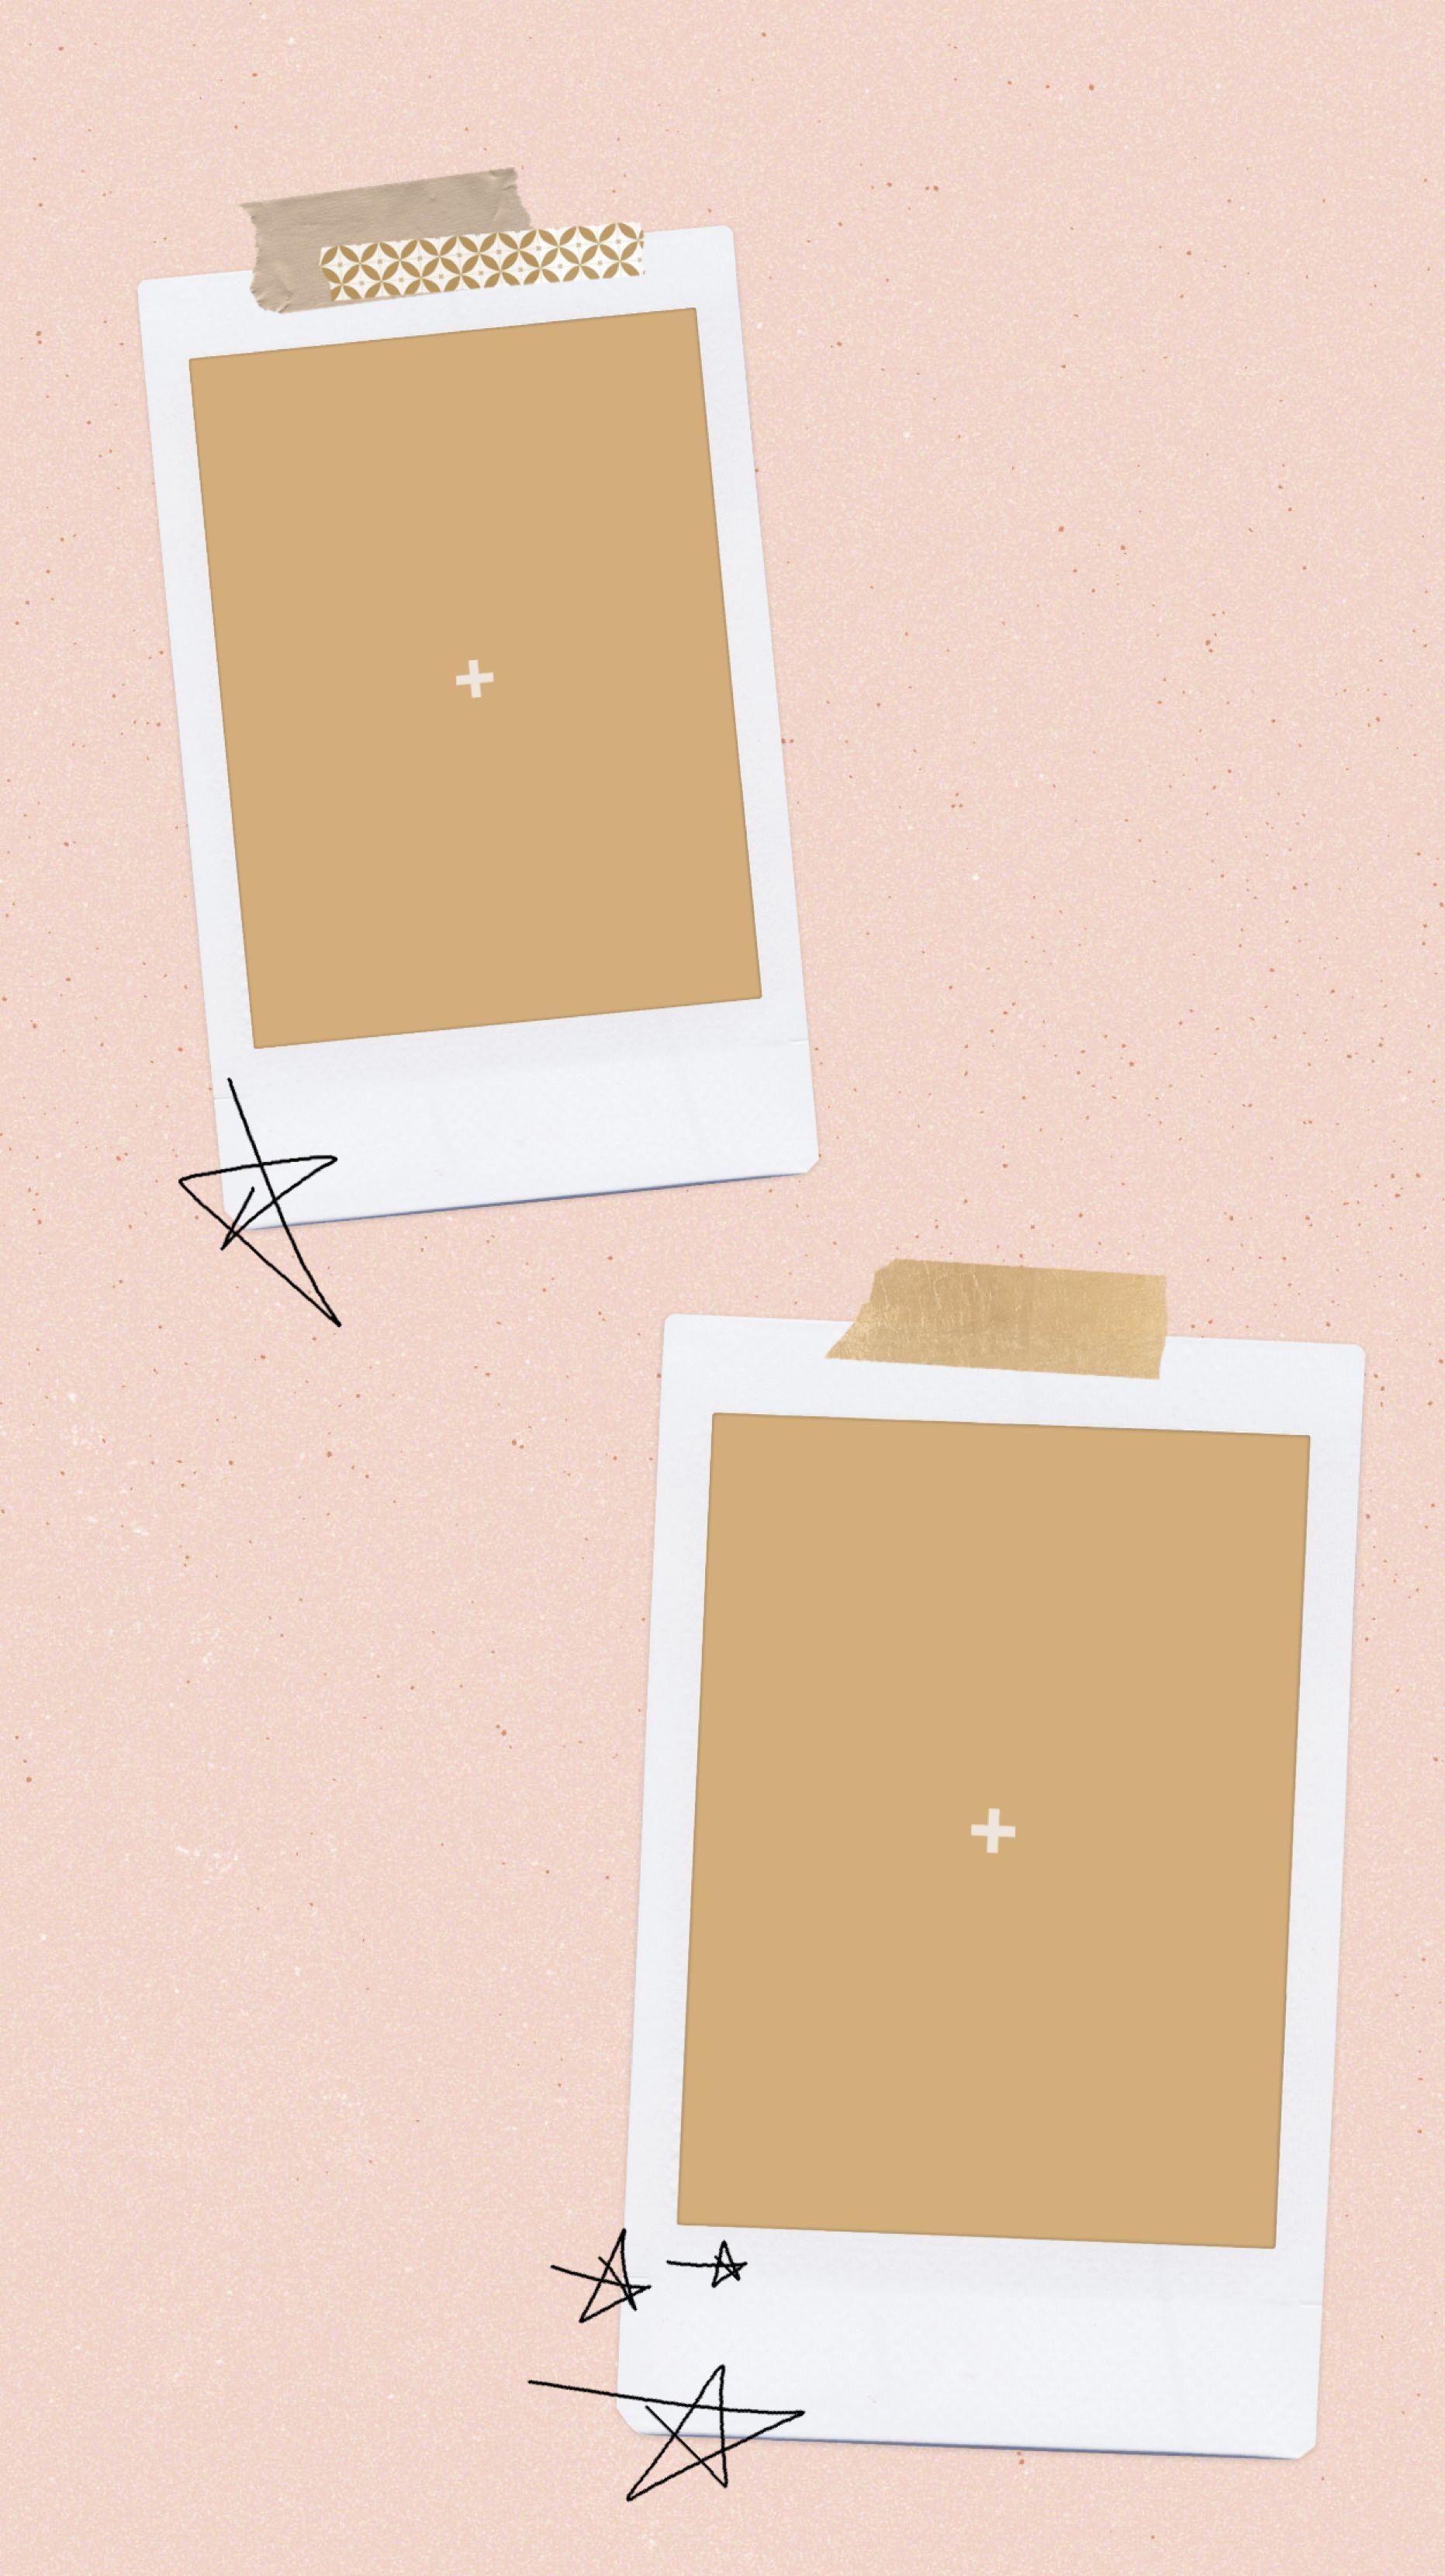 Pin Oleh Adisty Lintang Kinanti Kinanti Di Kotak Kartu Bunga Foto Abstrak Kolase Foto